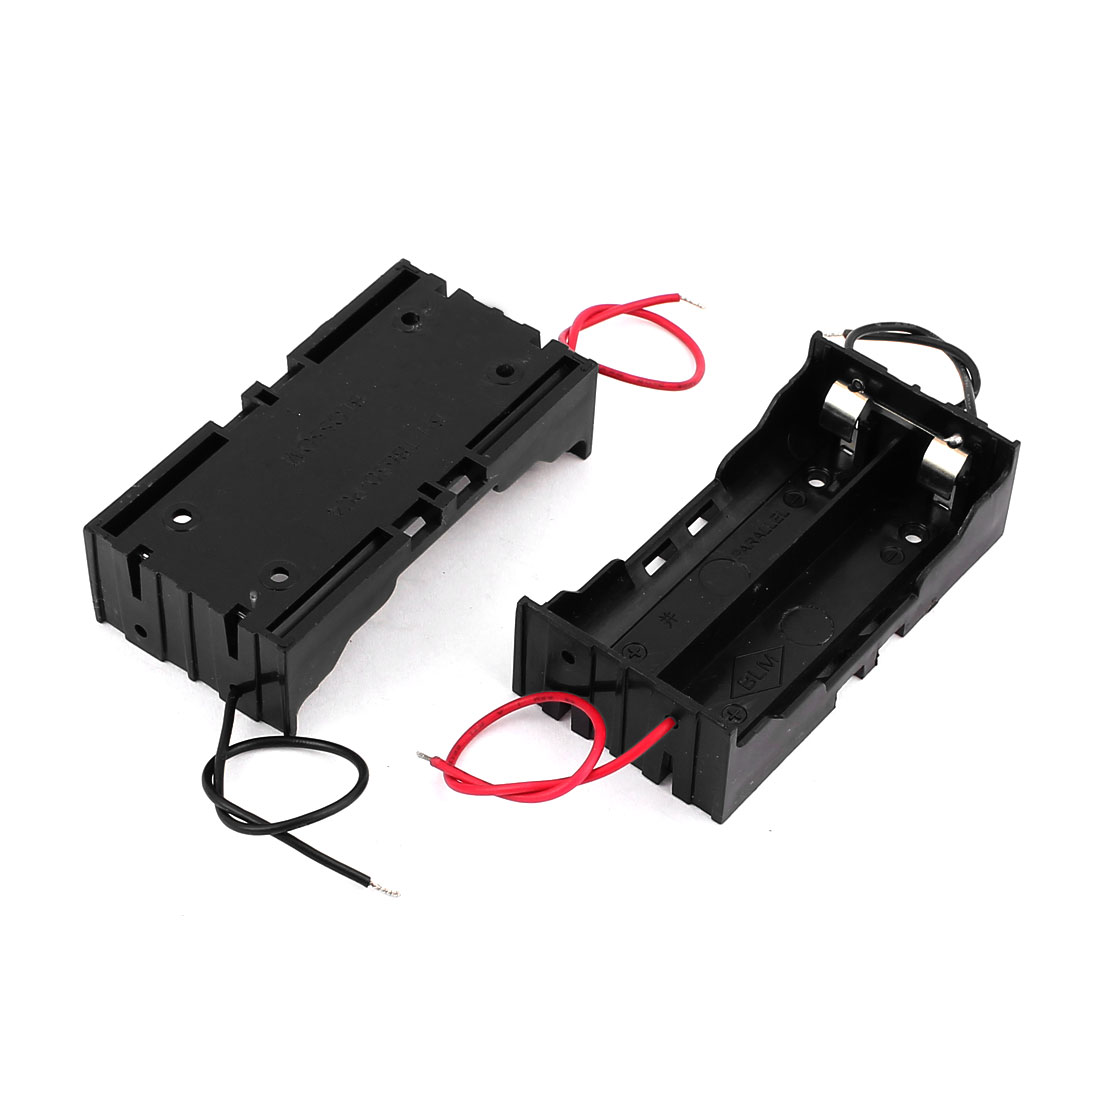 2Pcs Plastic 2 x 18650 Li-ion Battery Storage Holder Case Box Black